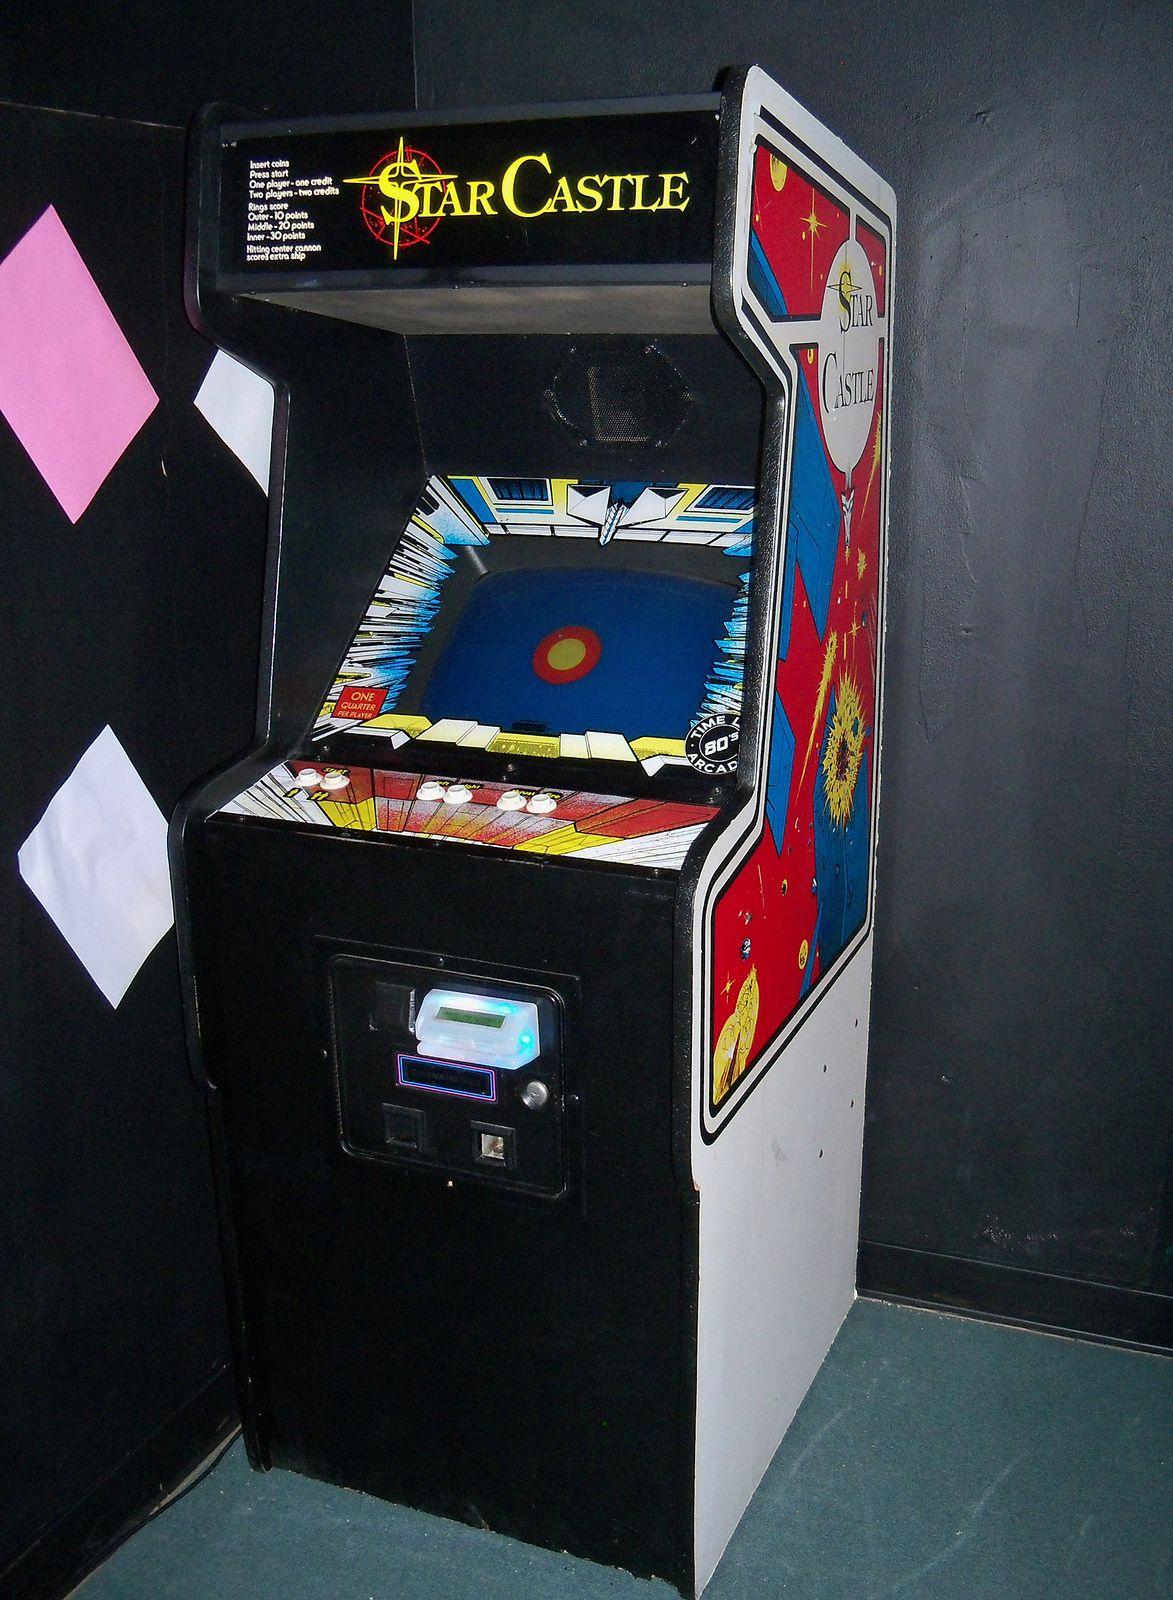 STAR CASTLE (With images) Retro arcade games, Retro